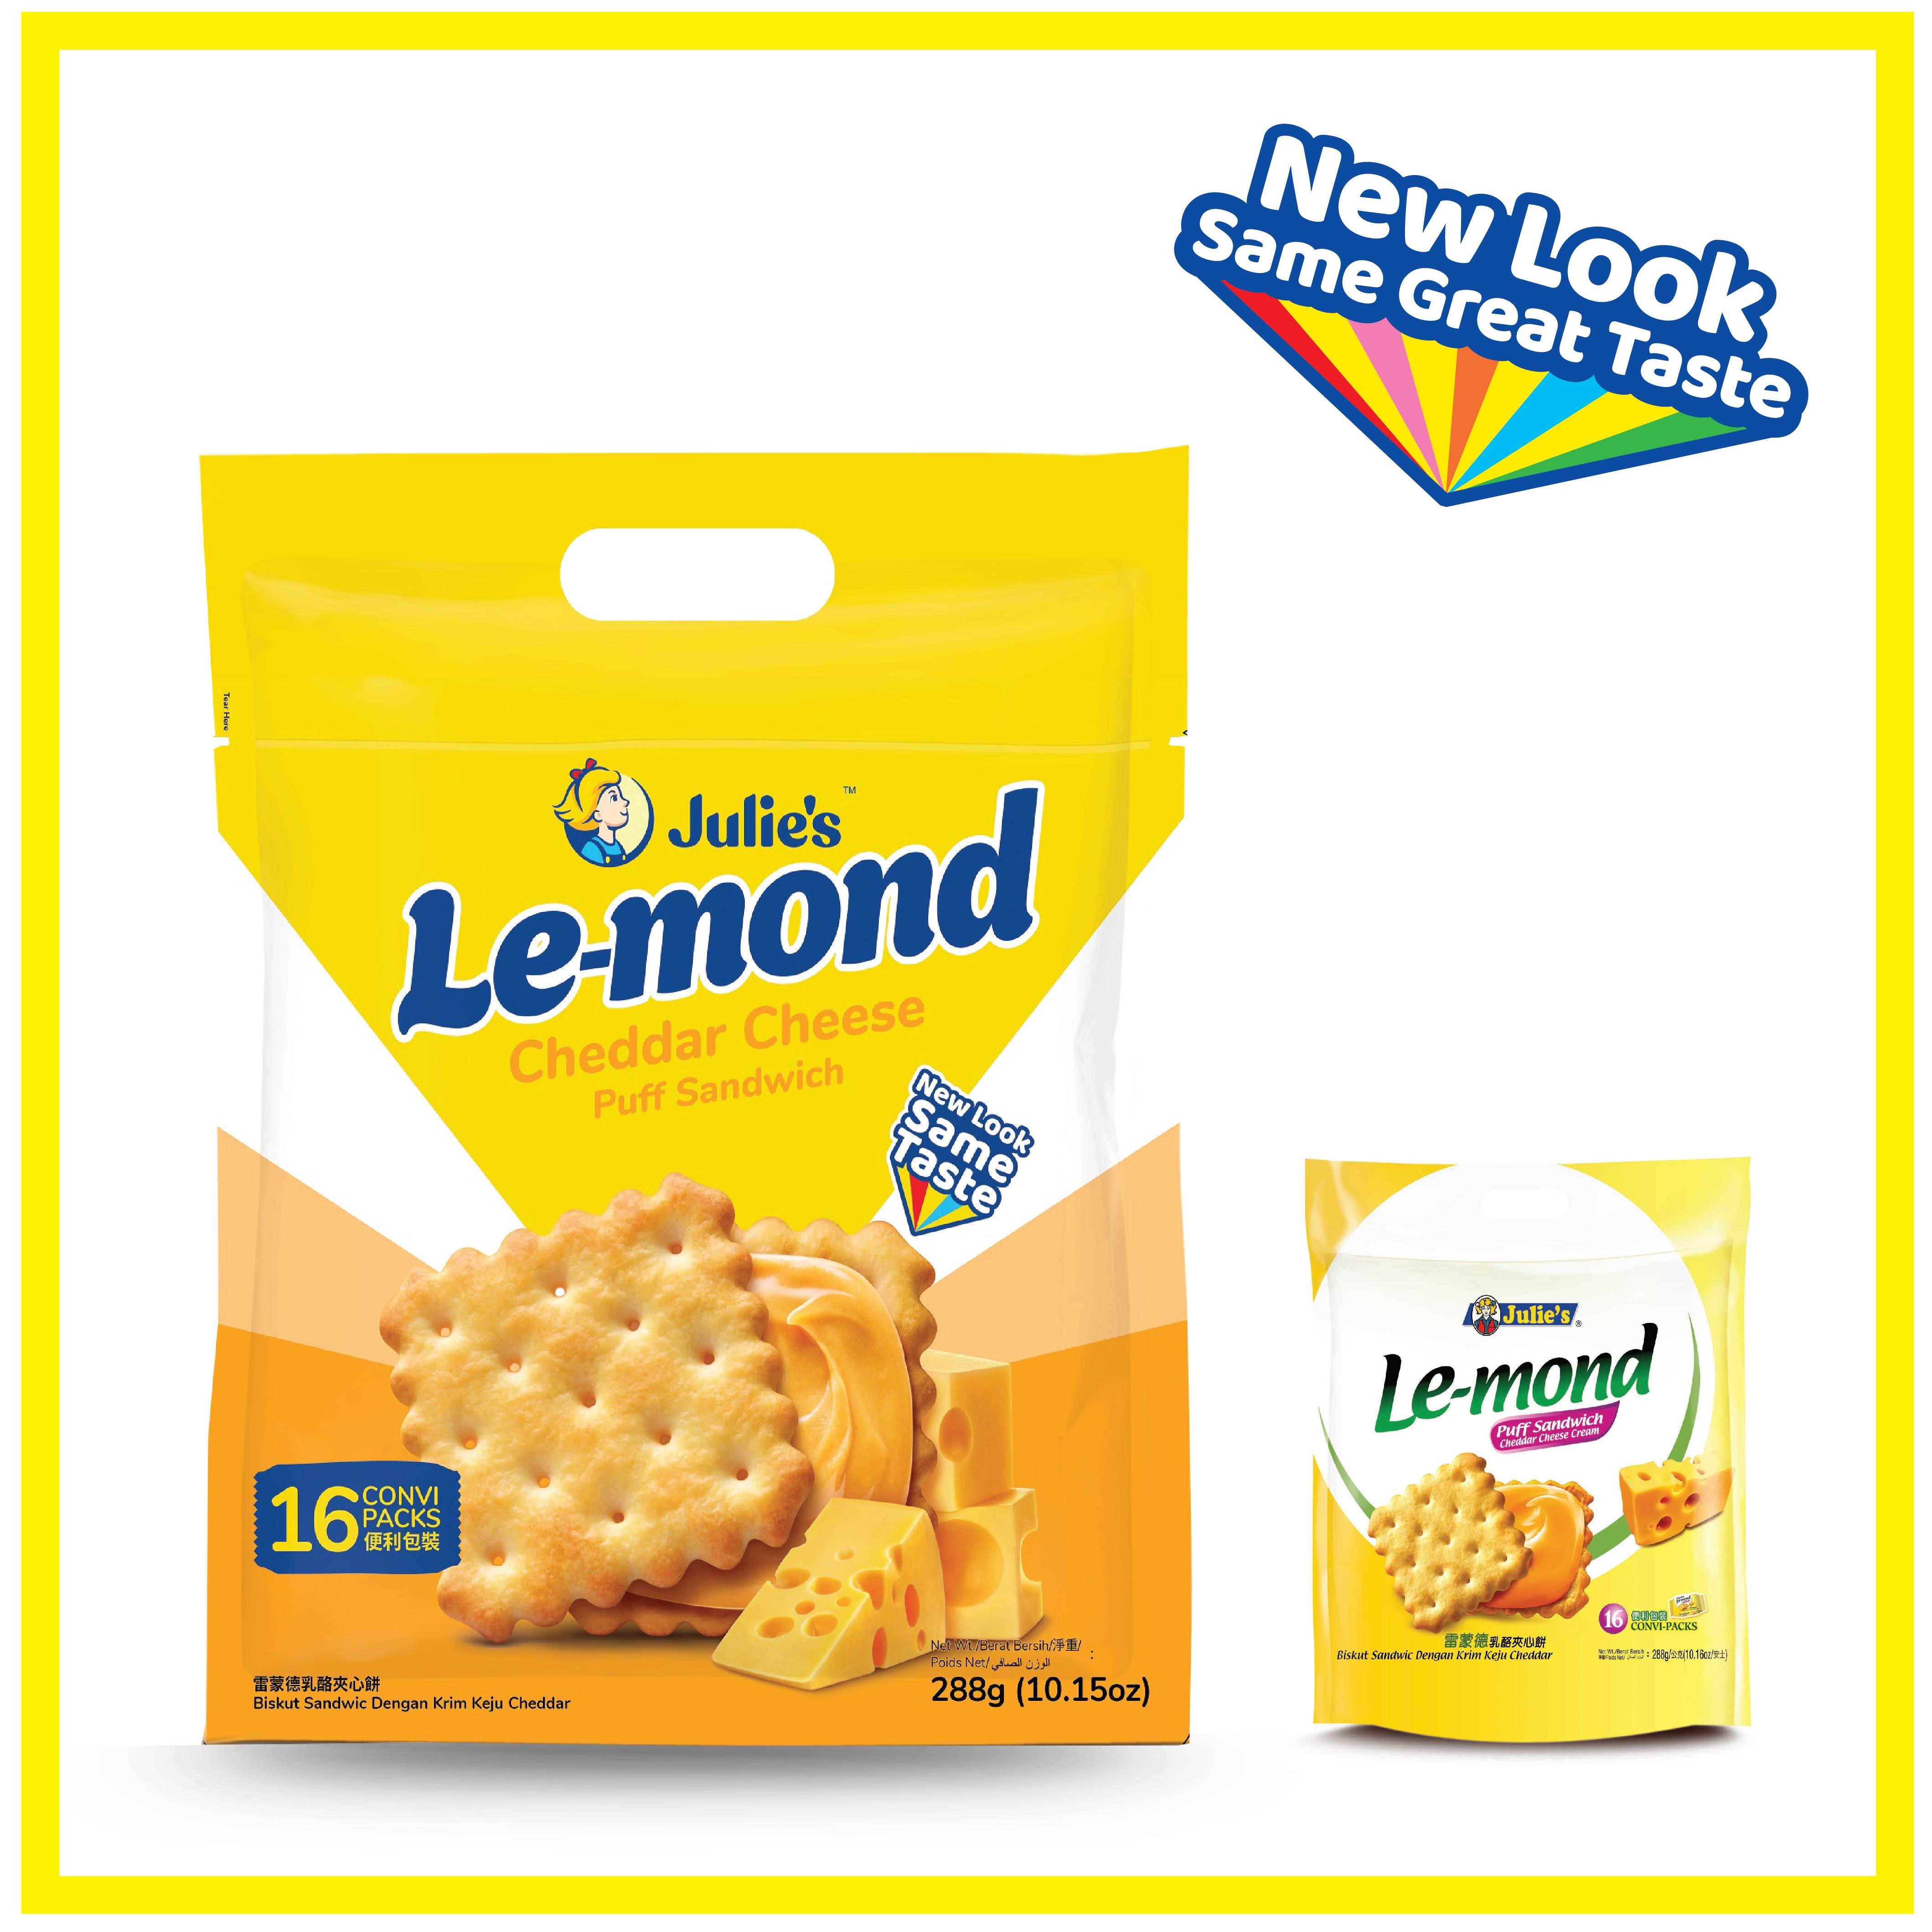 Julies Le-mond Cheddar Cheese 288g x 4 pack